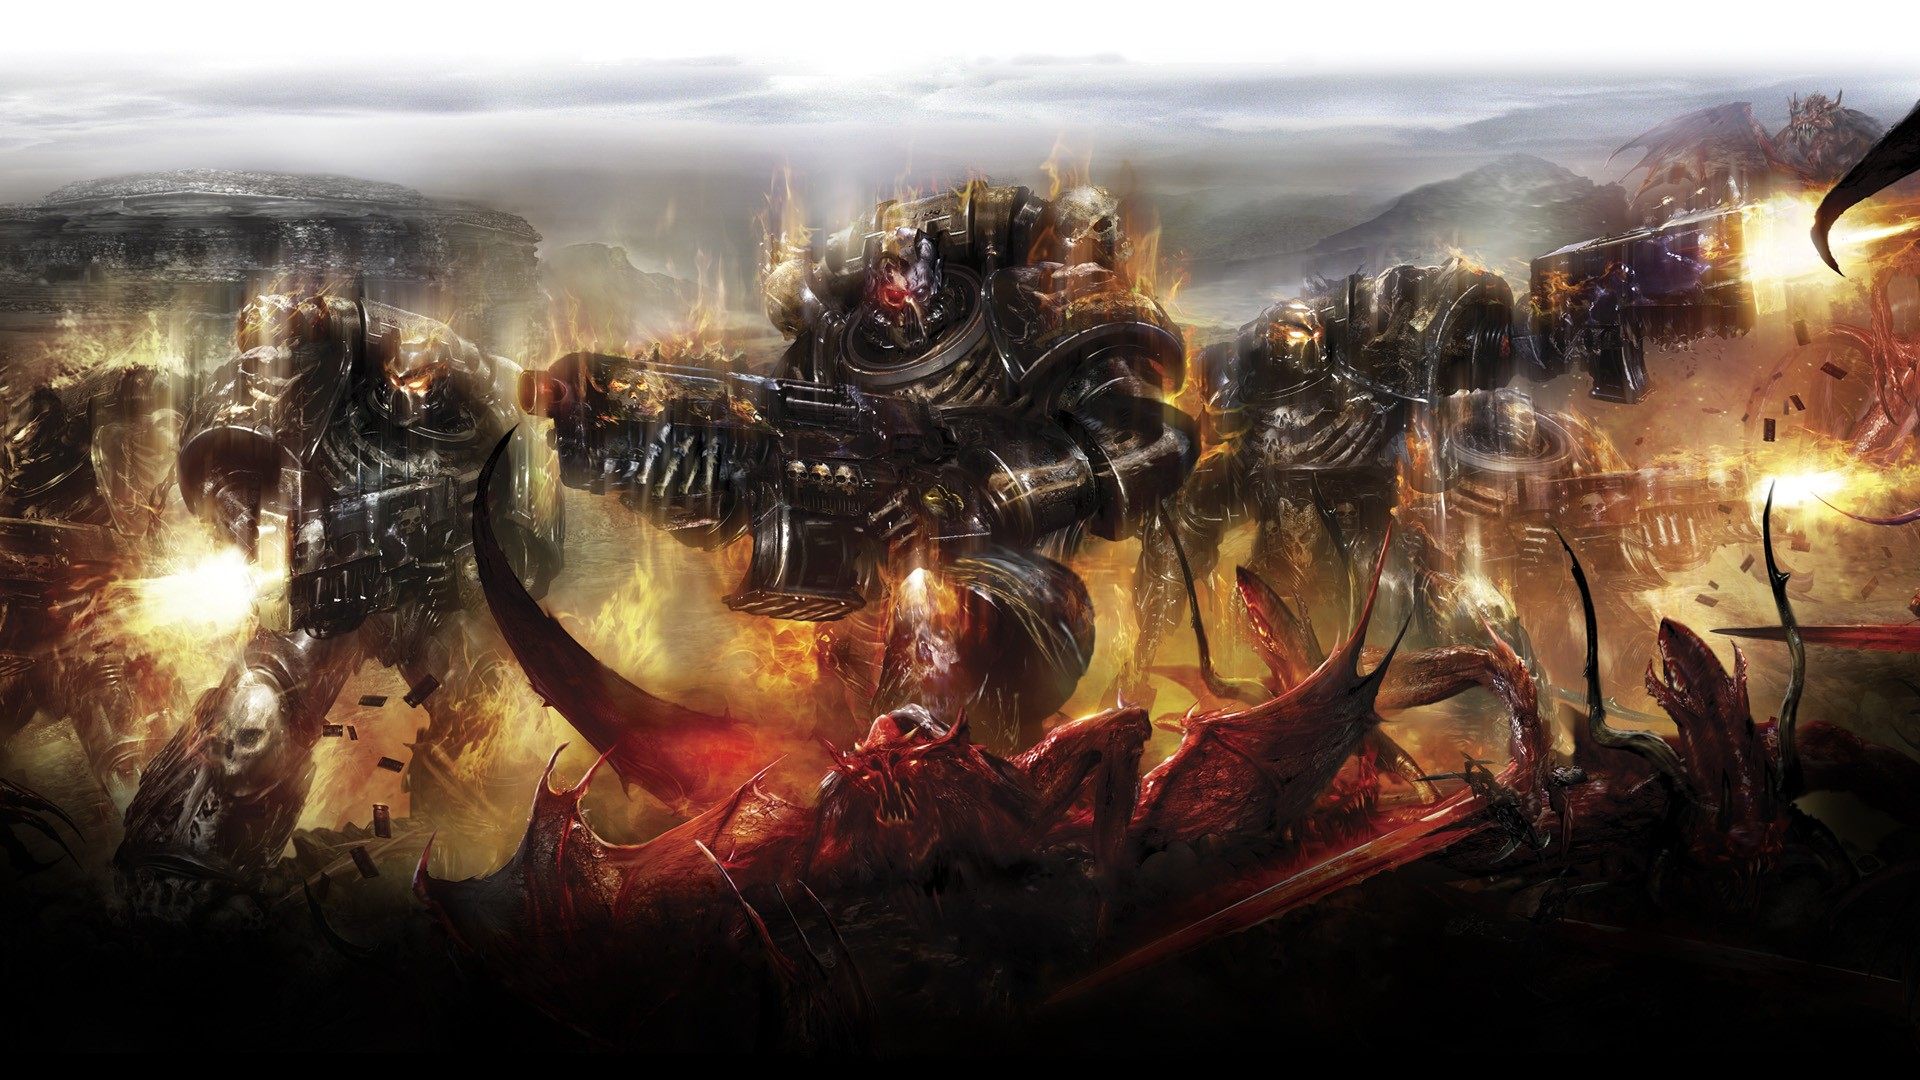 Warhammer 40K Wallpaper 1920x1080 Warhammer 40K Chaos Space Marine 1920x1080